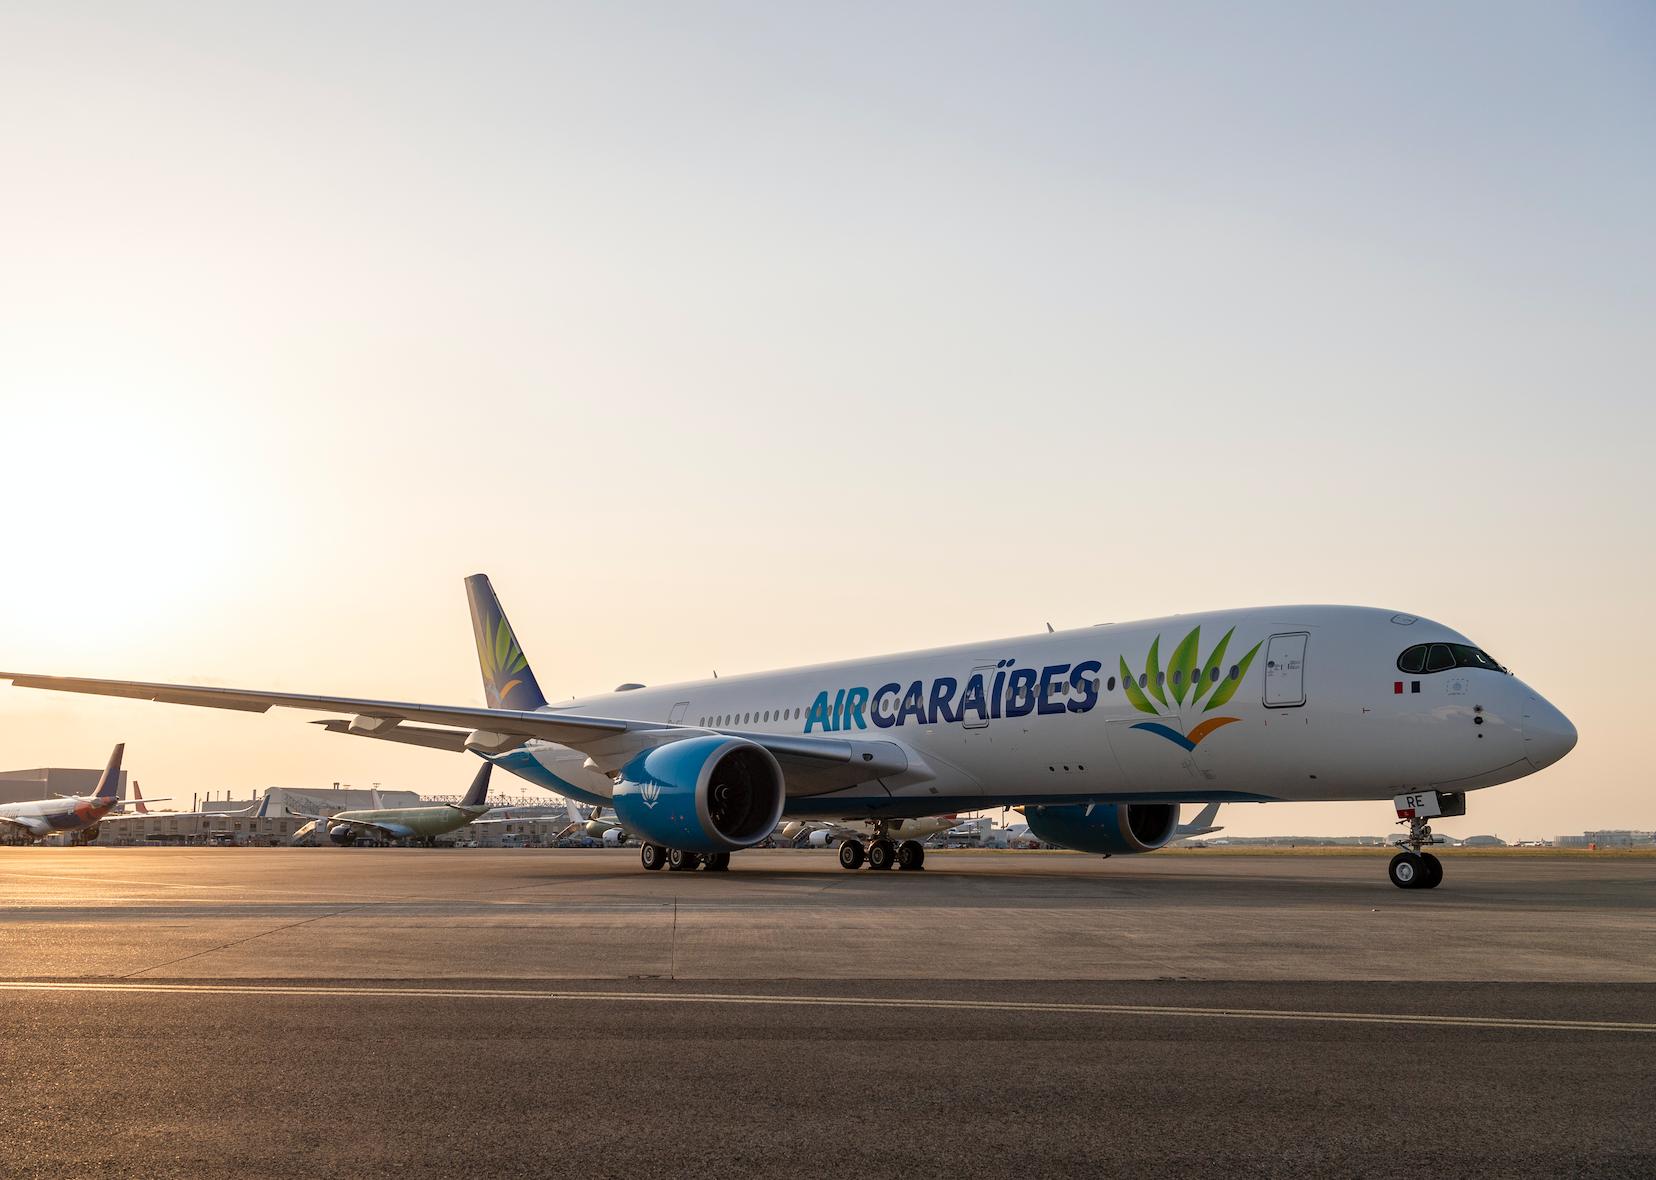 Jeudi 25 juillet 2019, Air Caraïbes a pris possession d'un A350-900 flambant neuf © Airbus 2019, A. Doumenjou / Master films